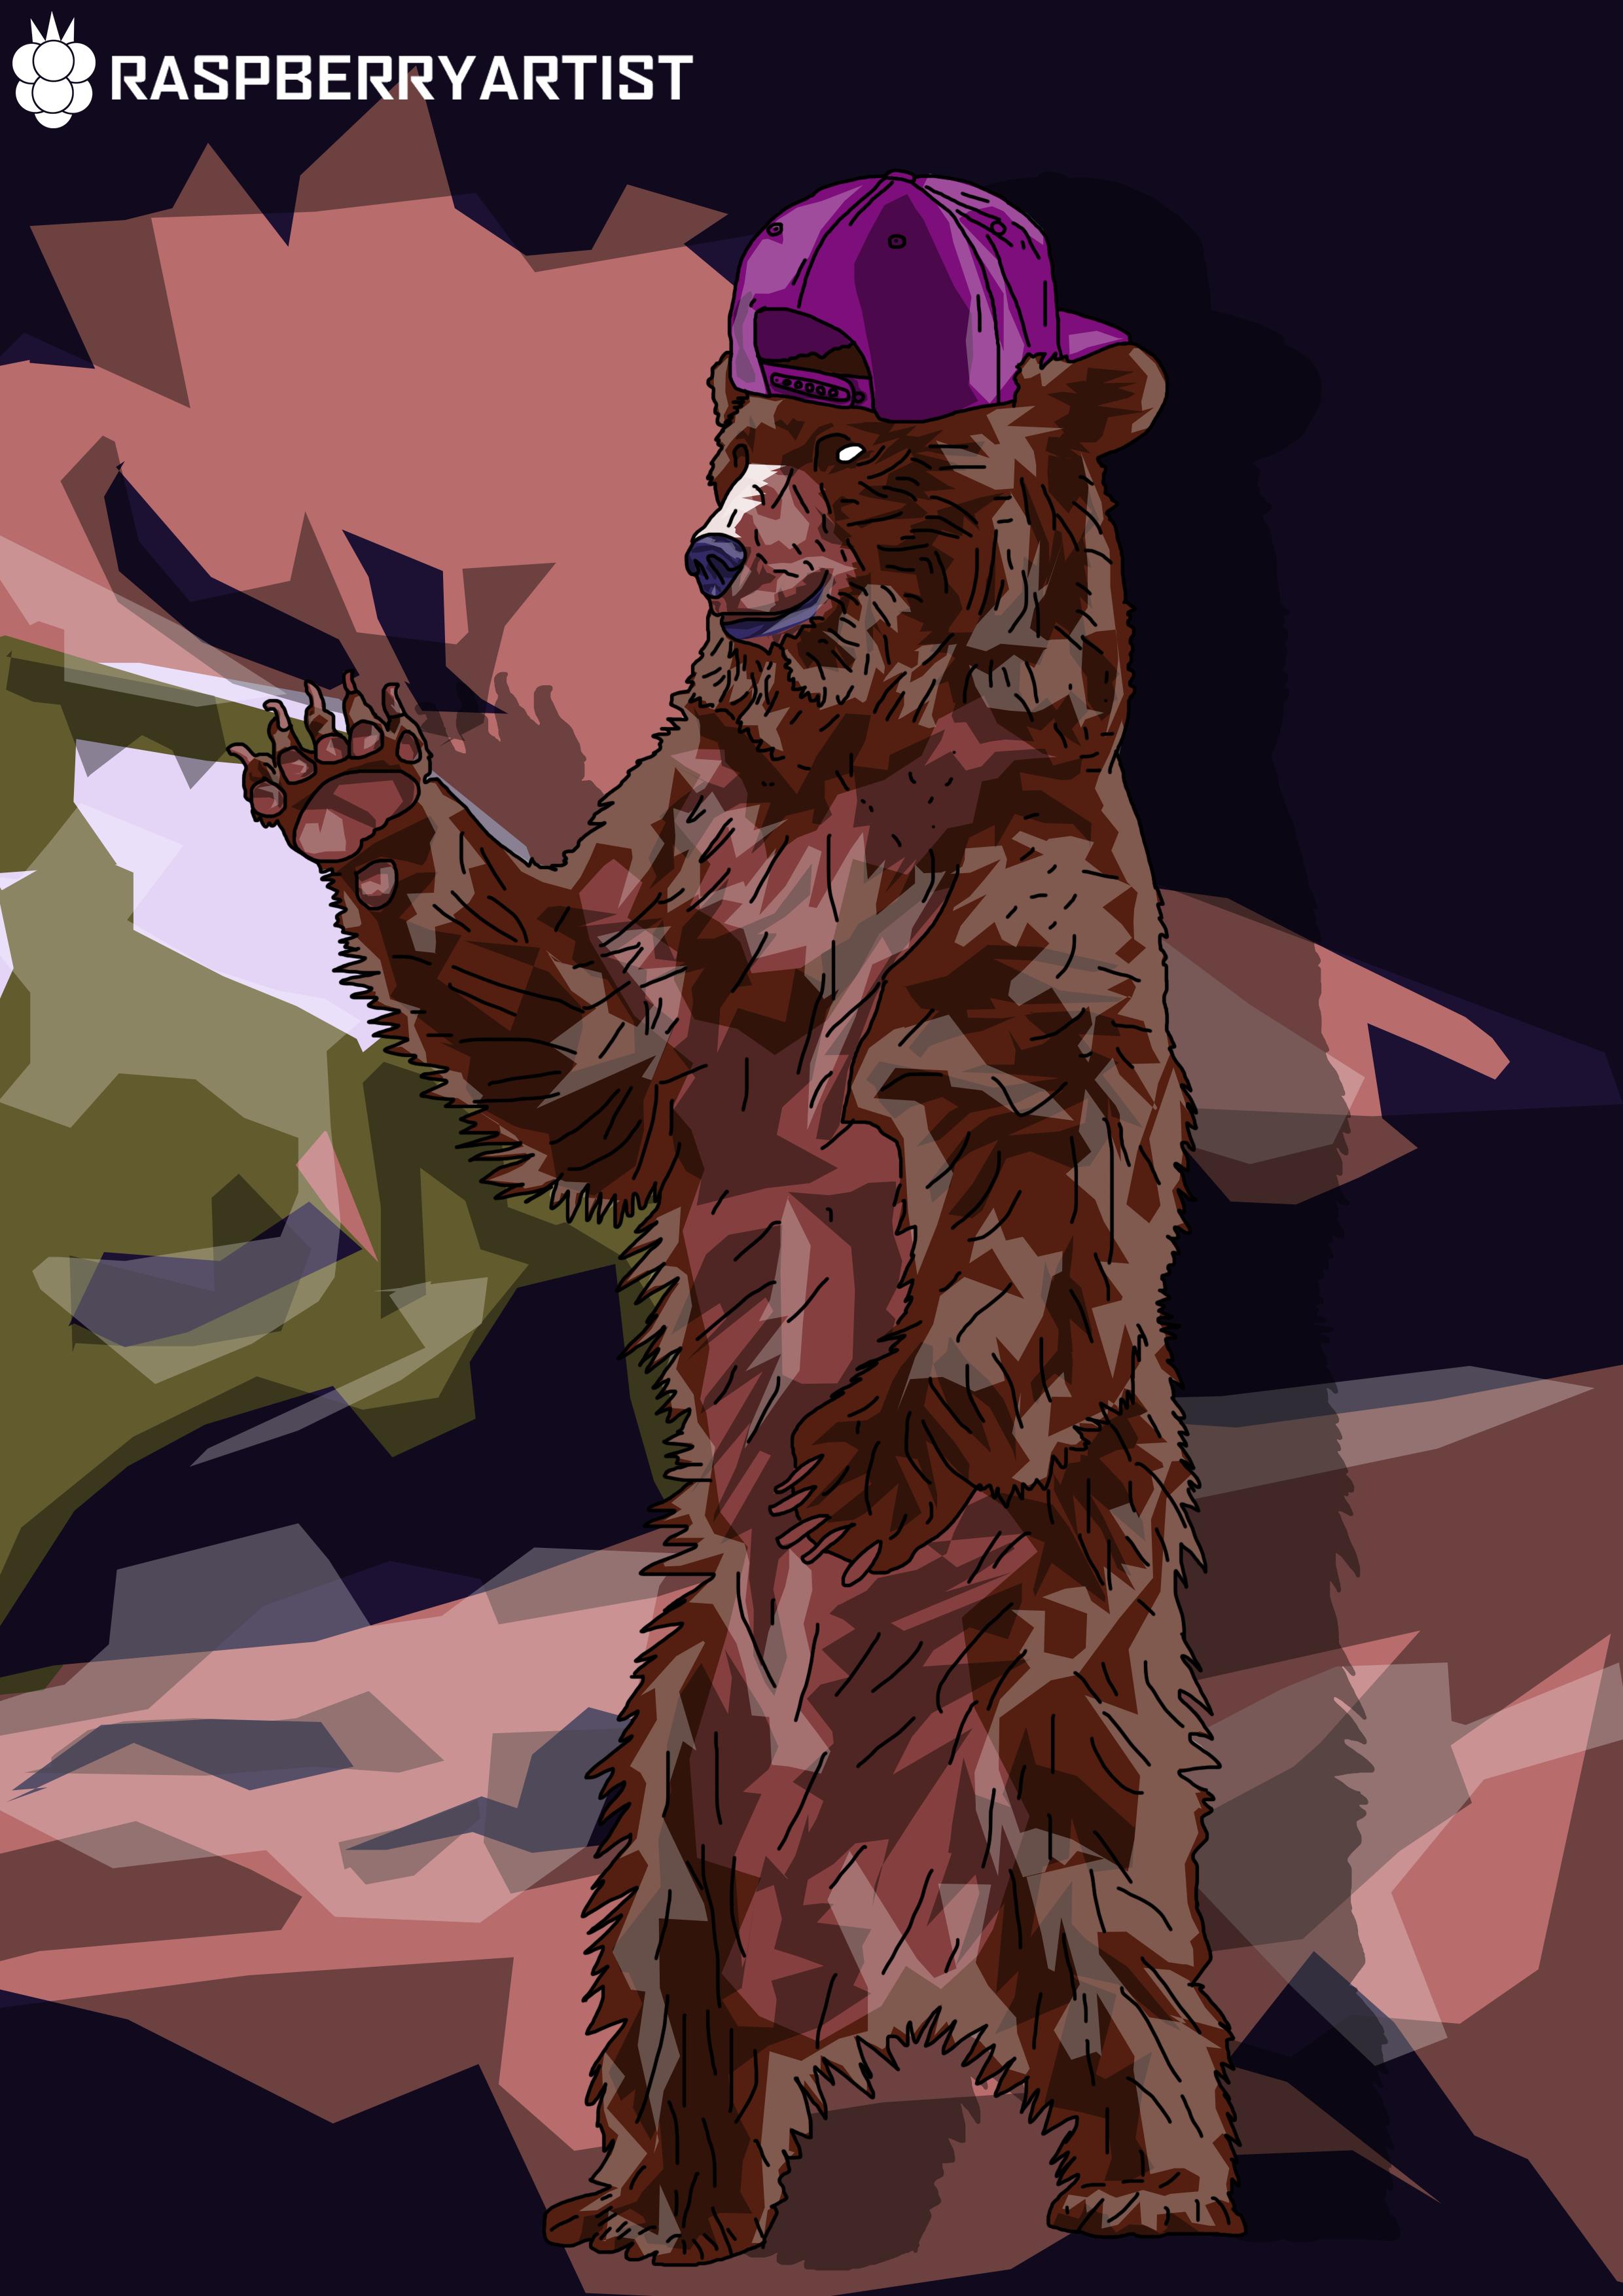 RUDE BEAR CARTOON